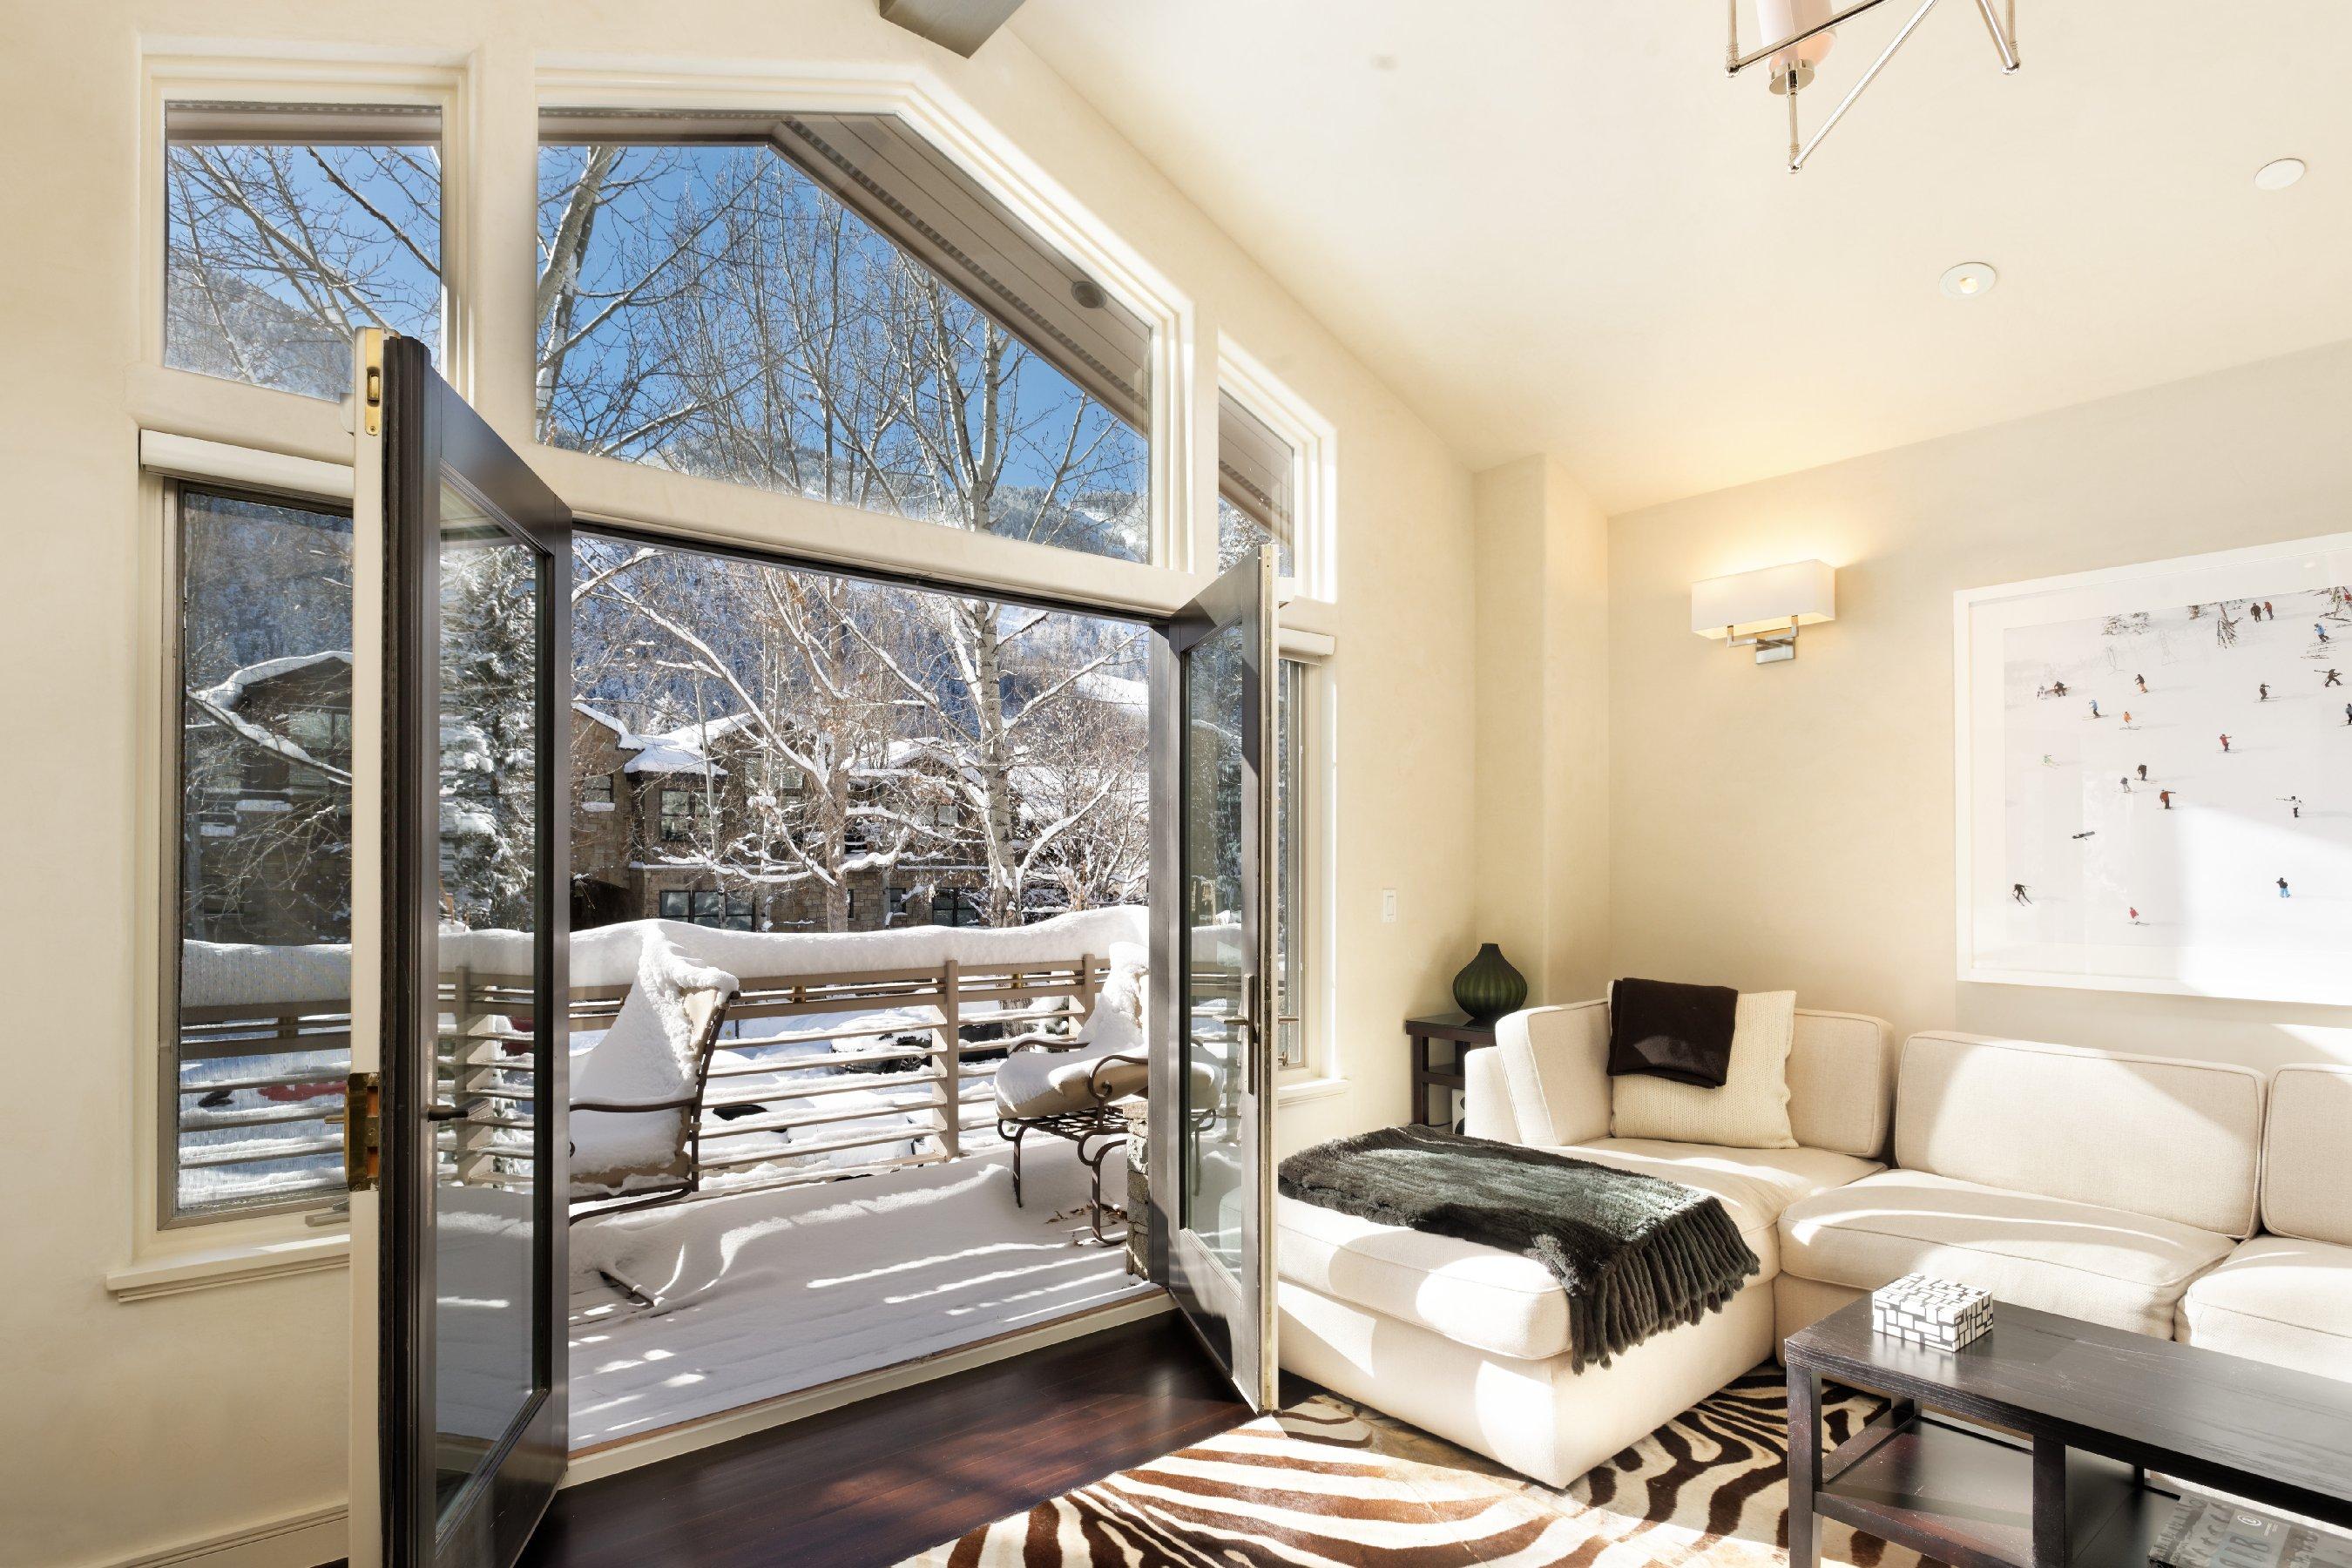 Casa unifamiliar adosada (Townhouse) por un Venta en Silverstream Townhomes 926 E. Durant Avenue Unit 4 Aspen, Colorado, 81611 Estados Unidos